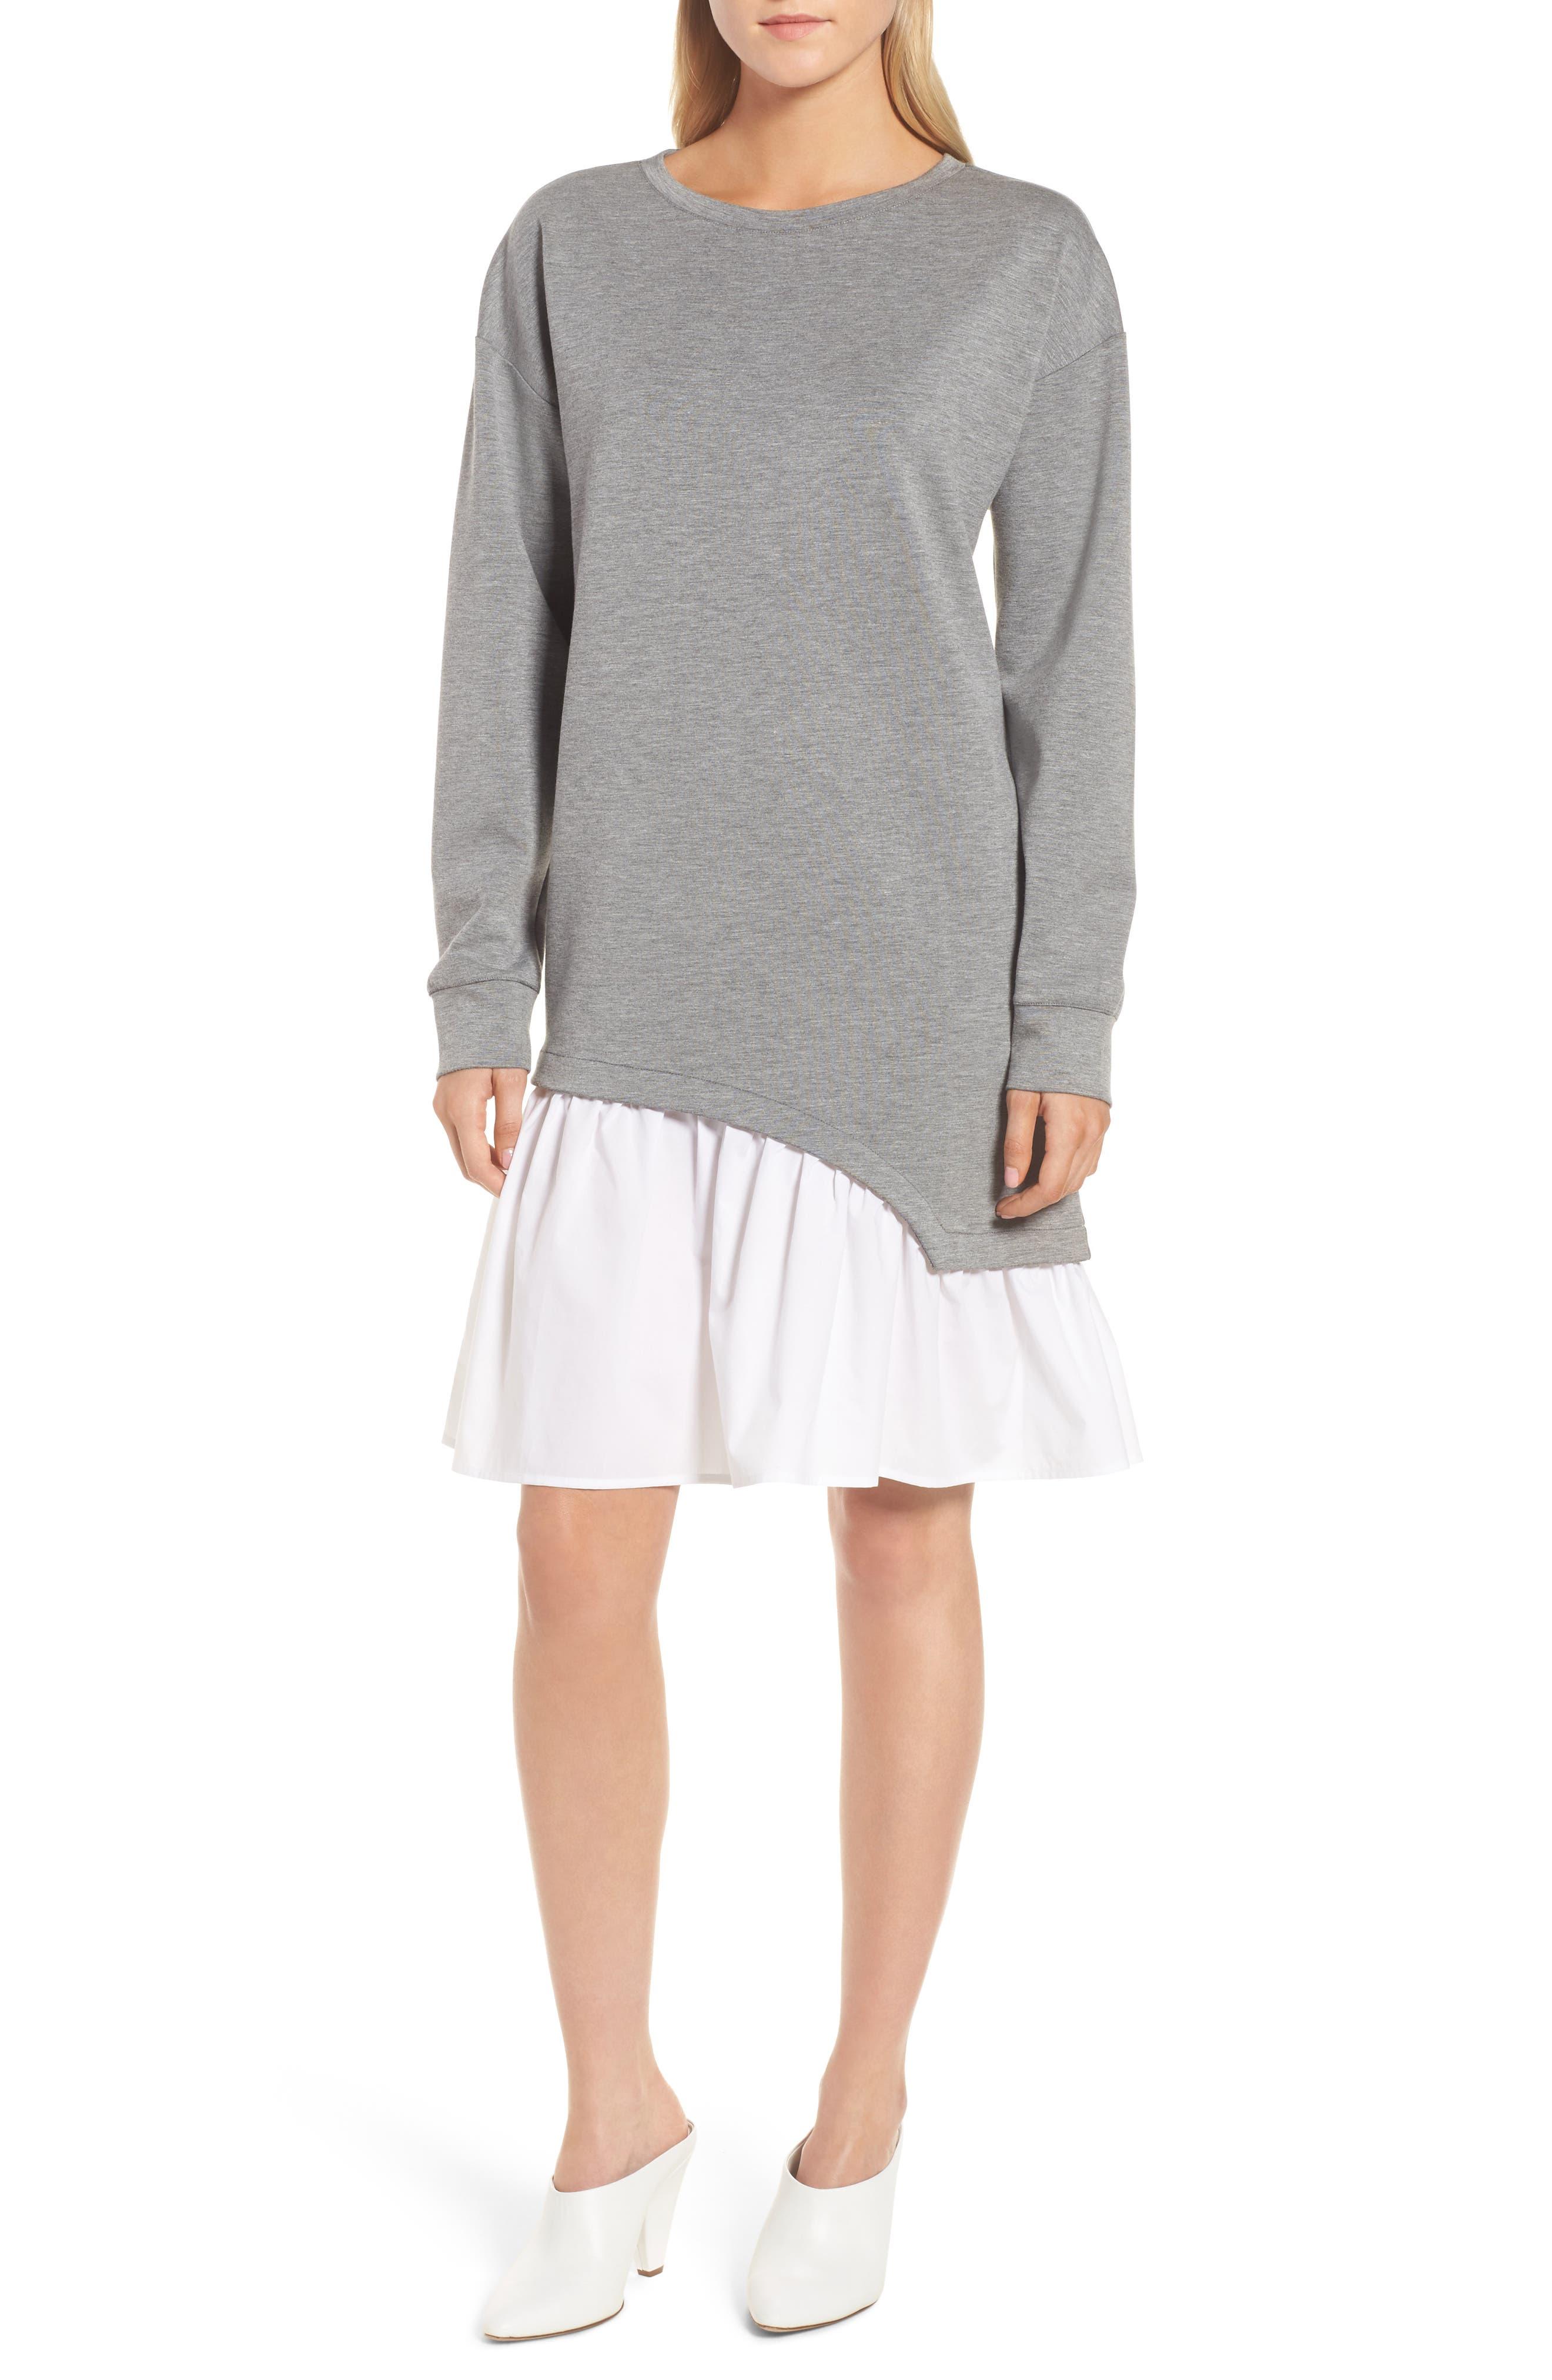 Mixed Media Sweatshirt Dress,                             Main thumbnail 1, color,                             030